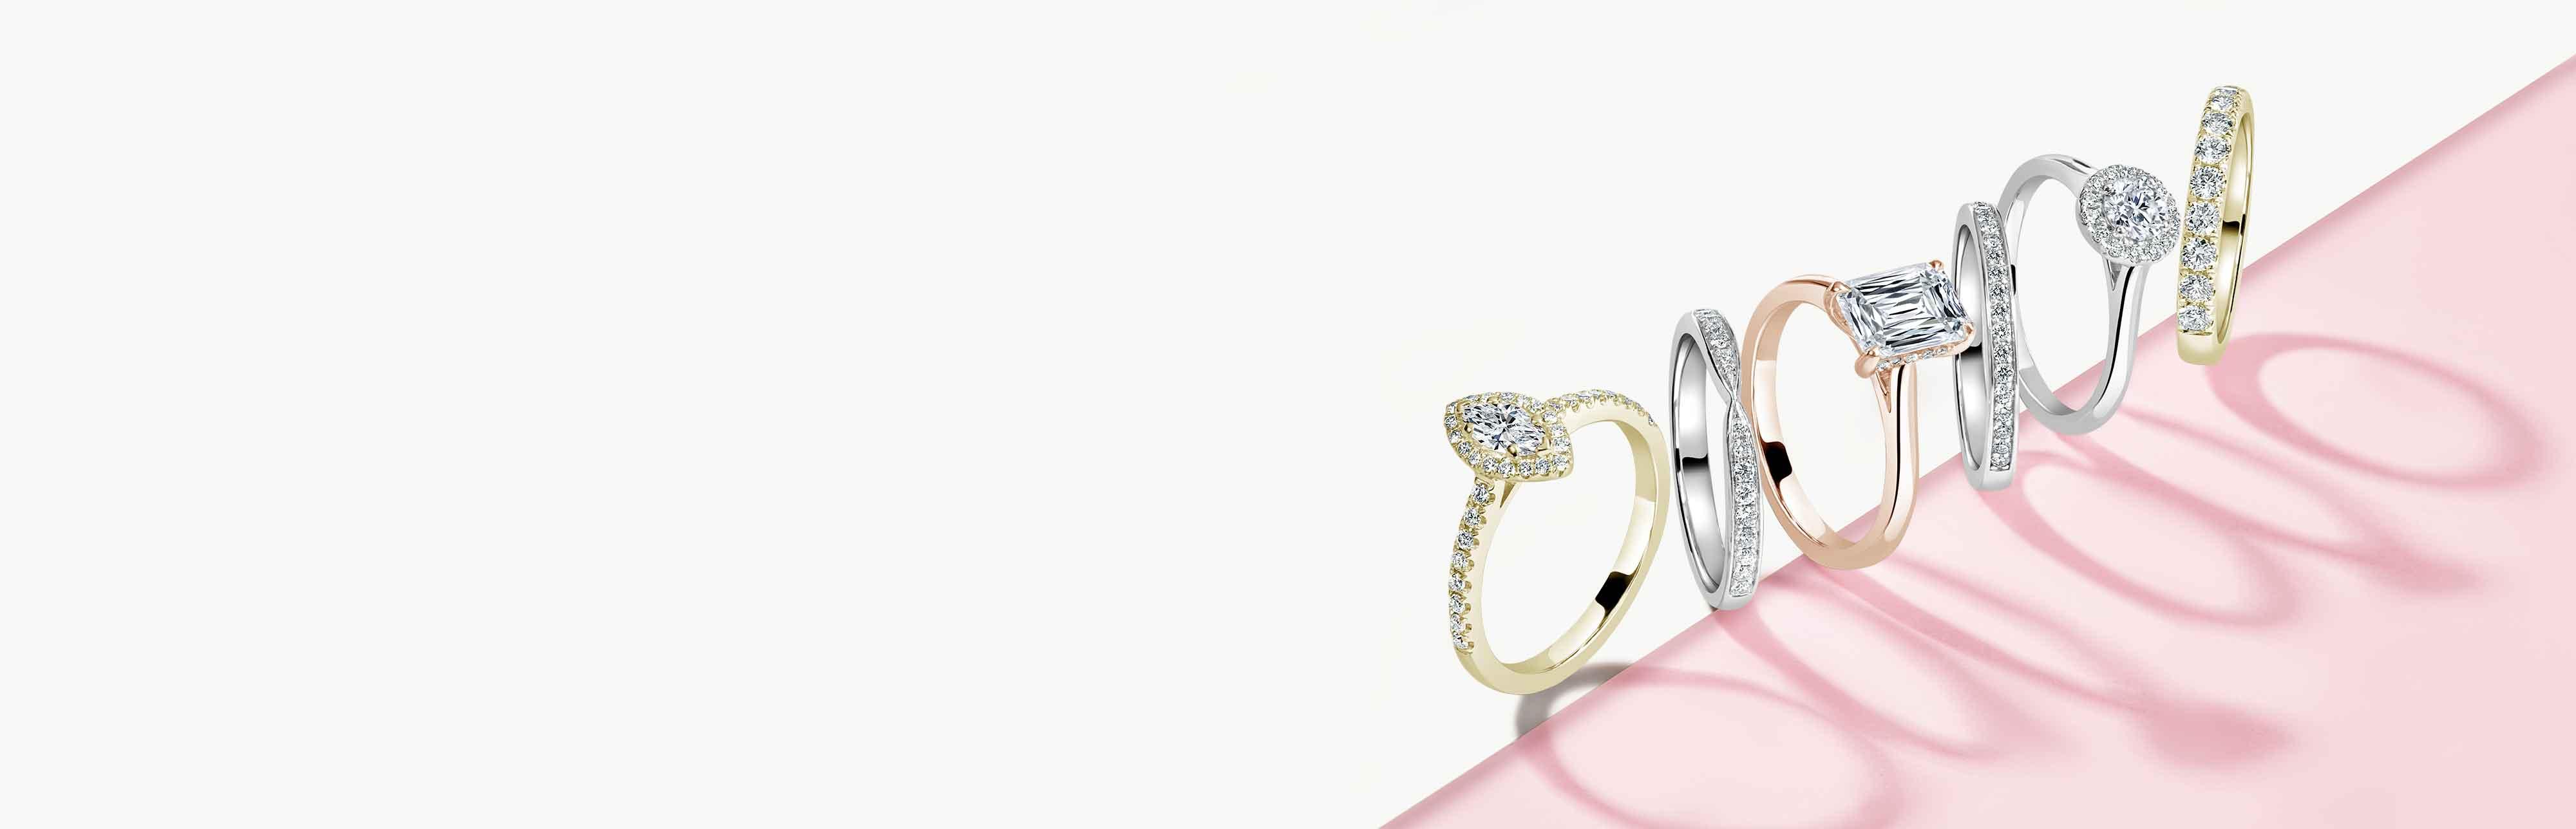 Platinum Pear Shaped Engagement Rings - Steven Stone